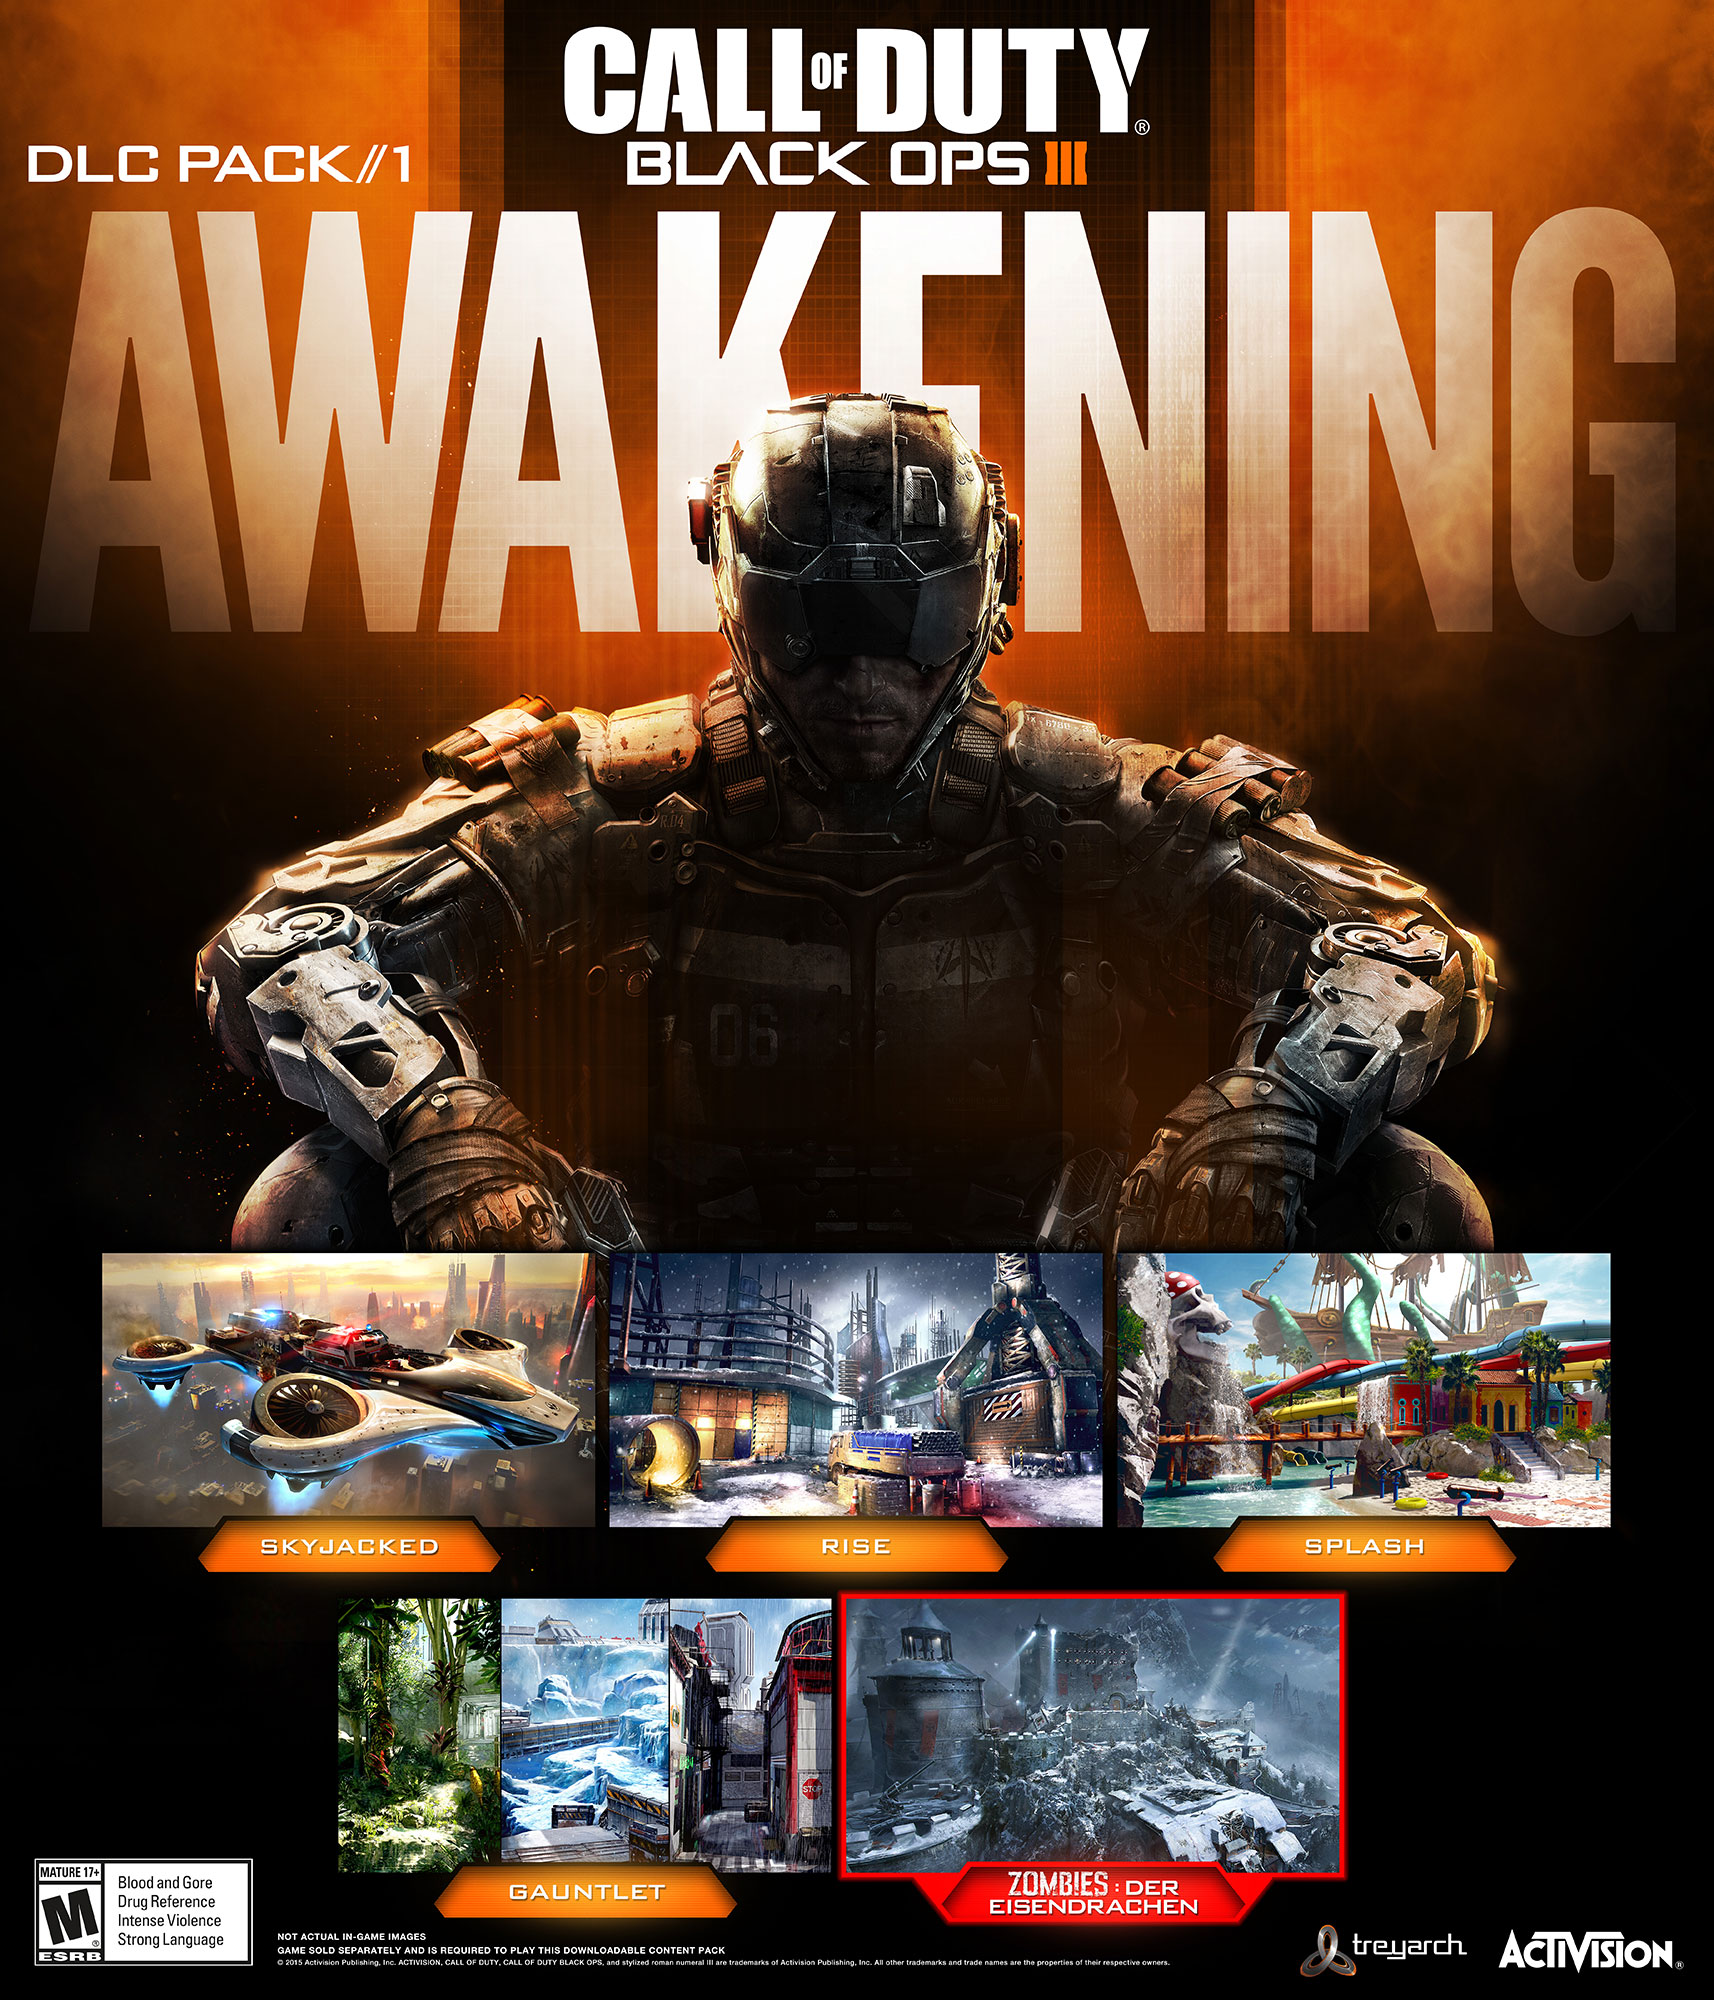 call_of_duty_black_ops_3_awakening